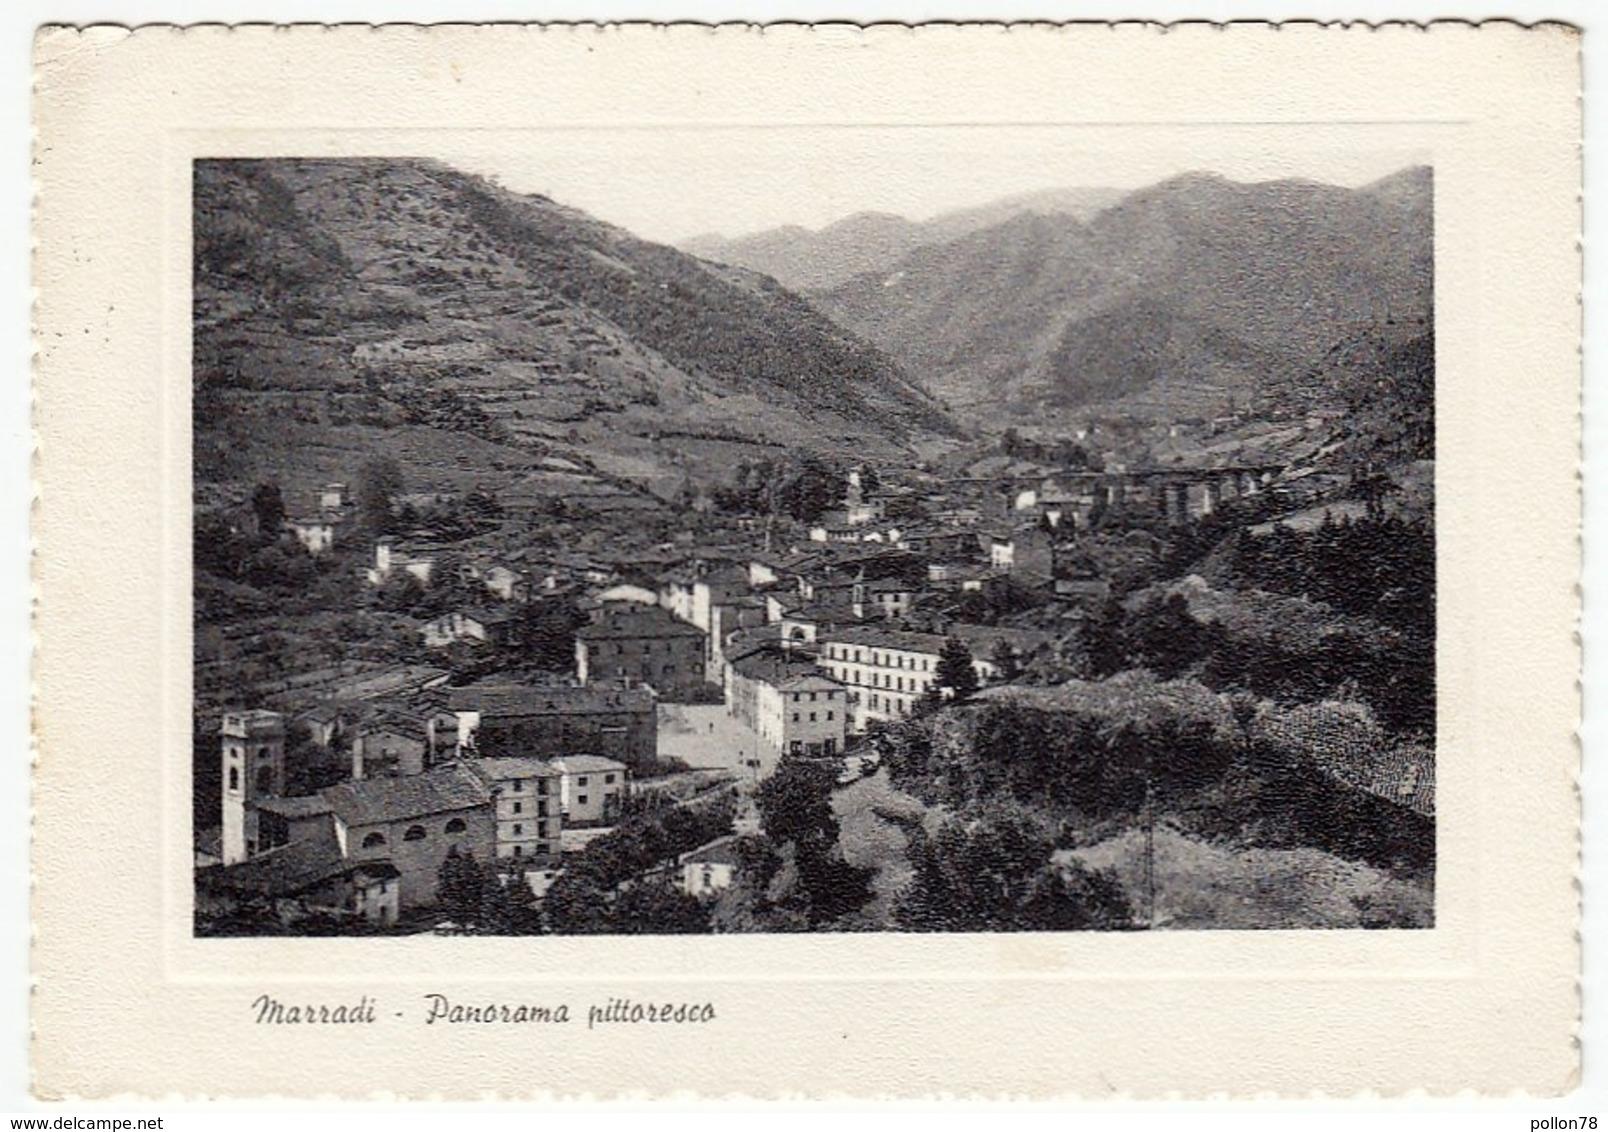 MARRADI - PANORAMA PITTORESCO - FIRENZE - 1962 - Firenze